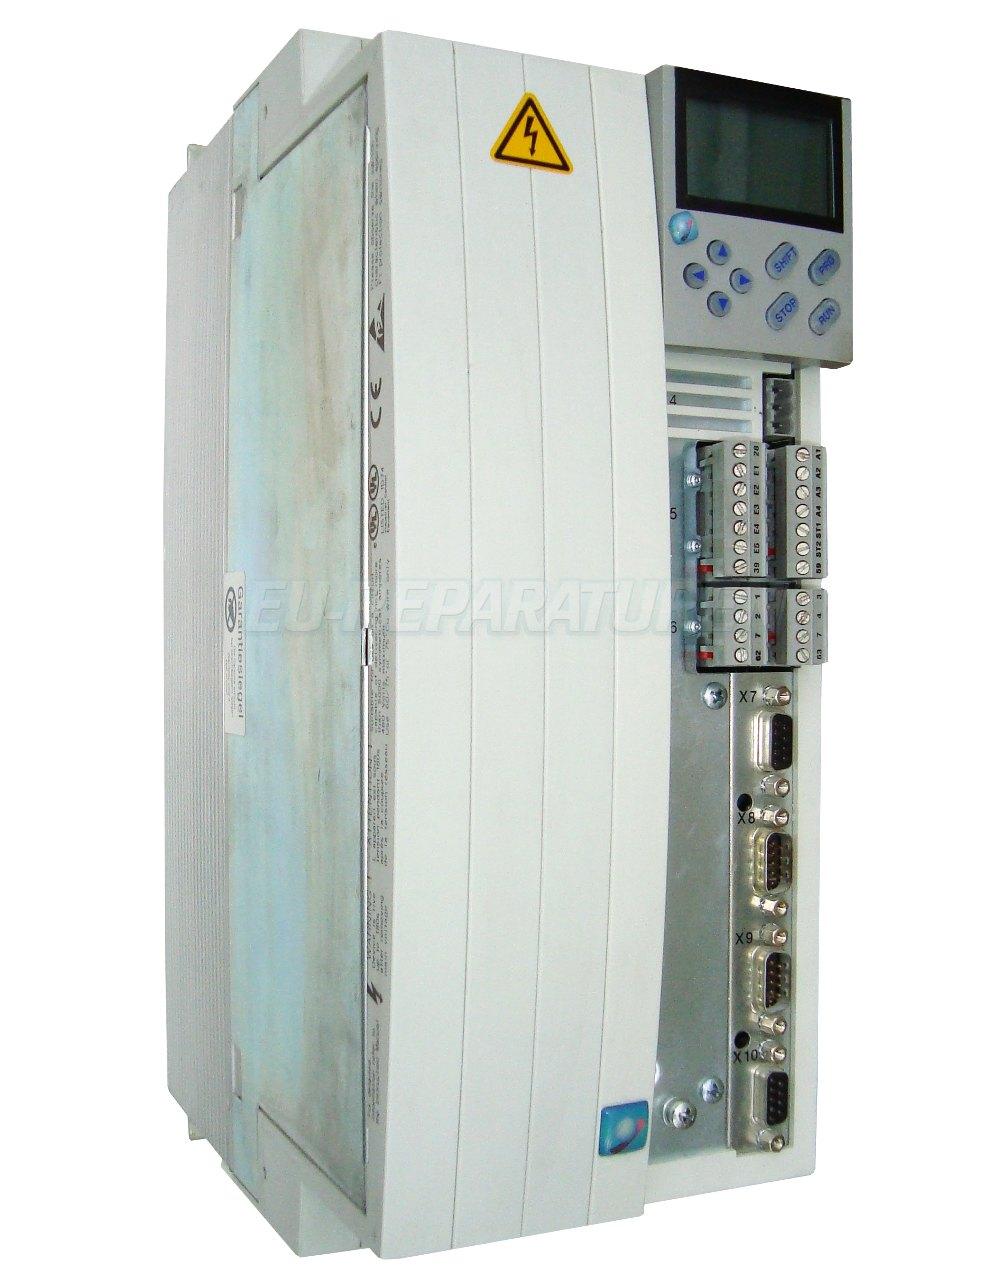 Reparatur Lenze EVS9326-ER AC DRIVE